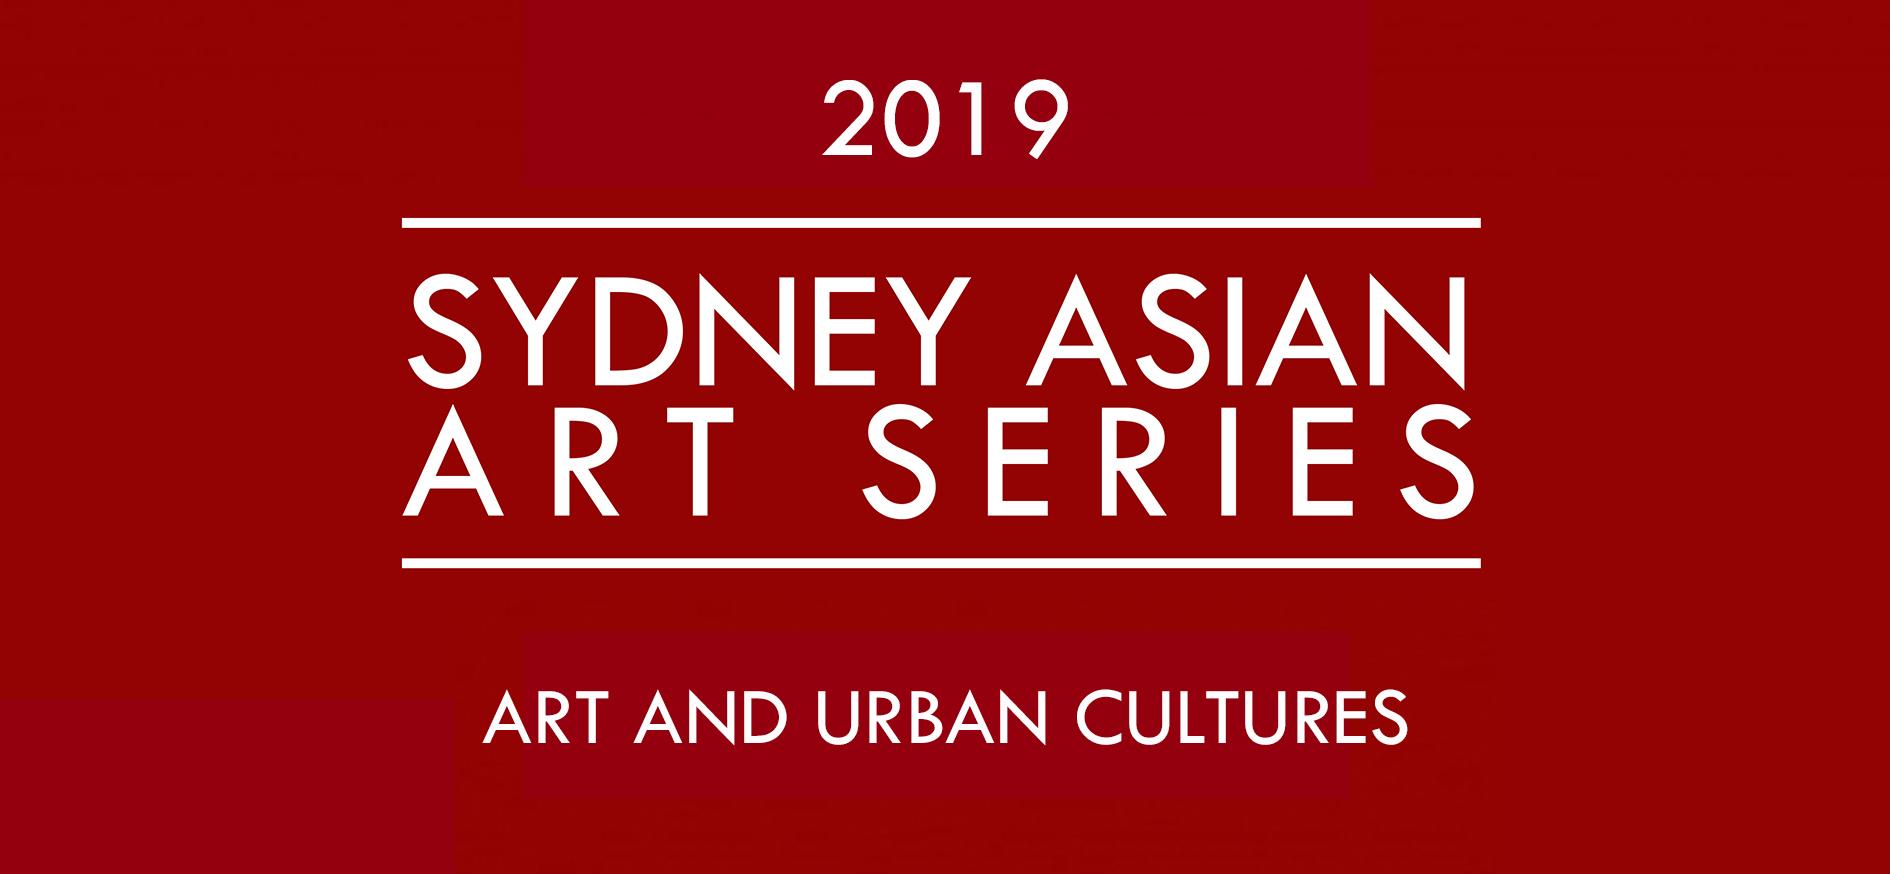 Sydney Asian Art Series 2019